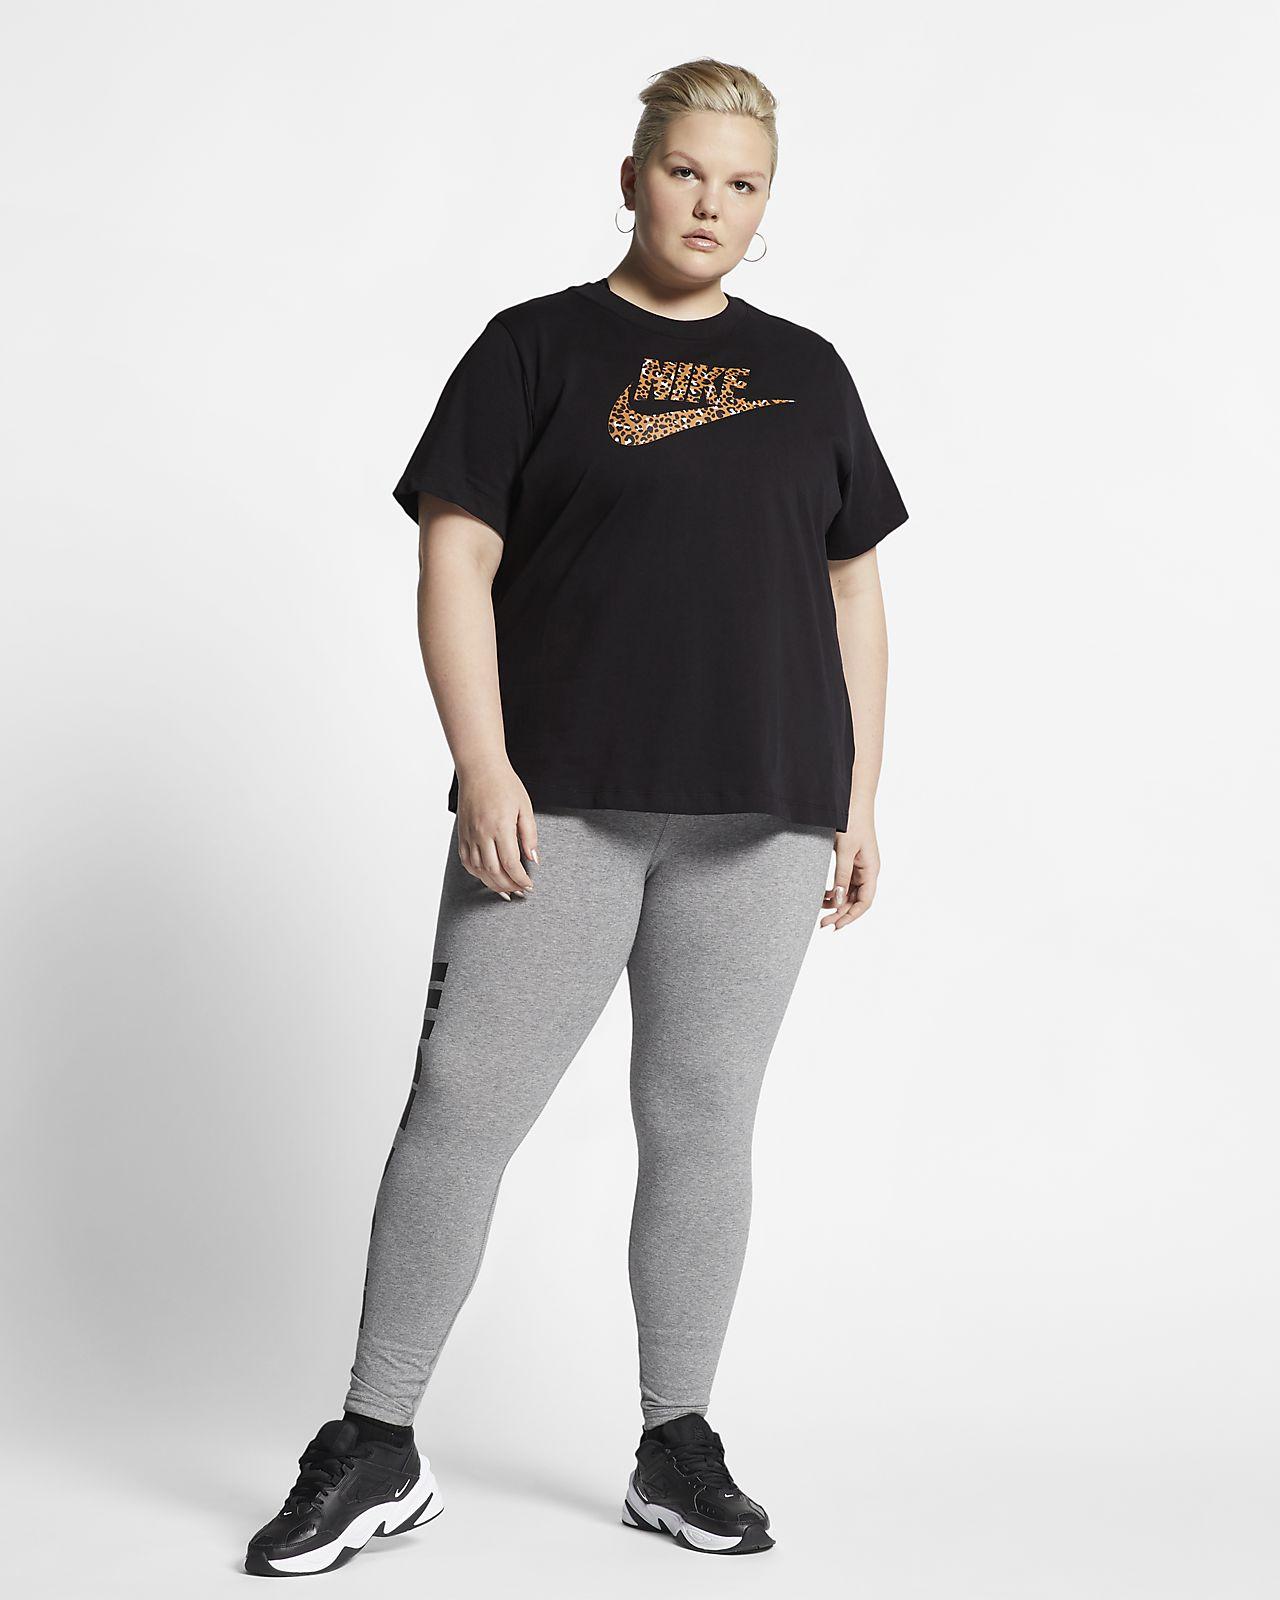 Женская футболка с коротким рукавом Nike Sportswear Animal Print (большие размеры)